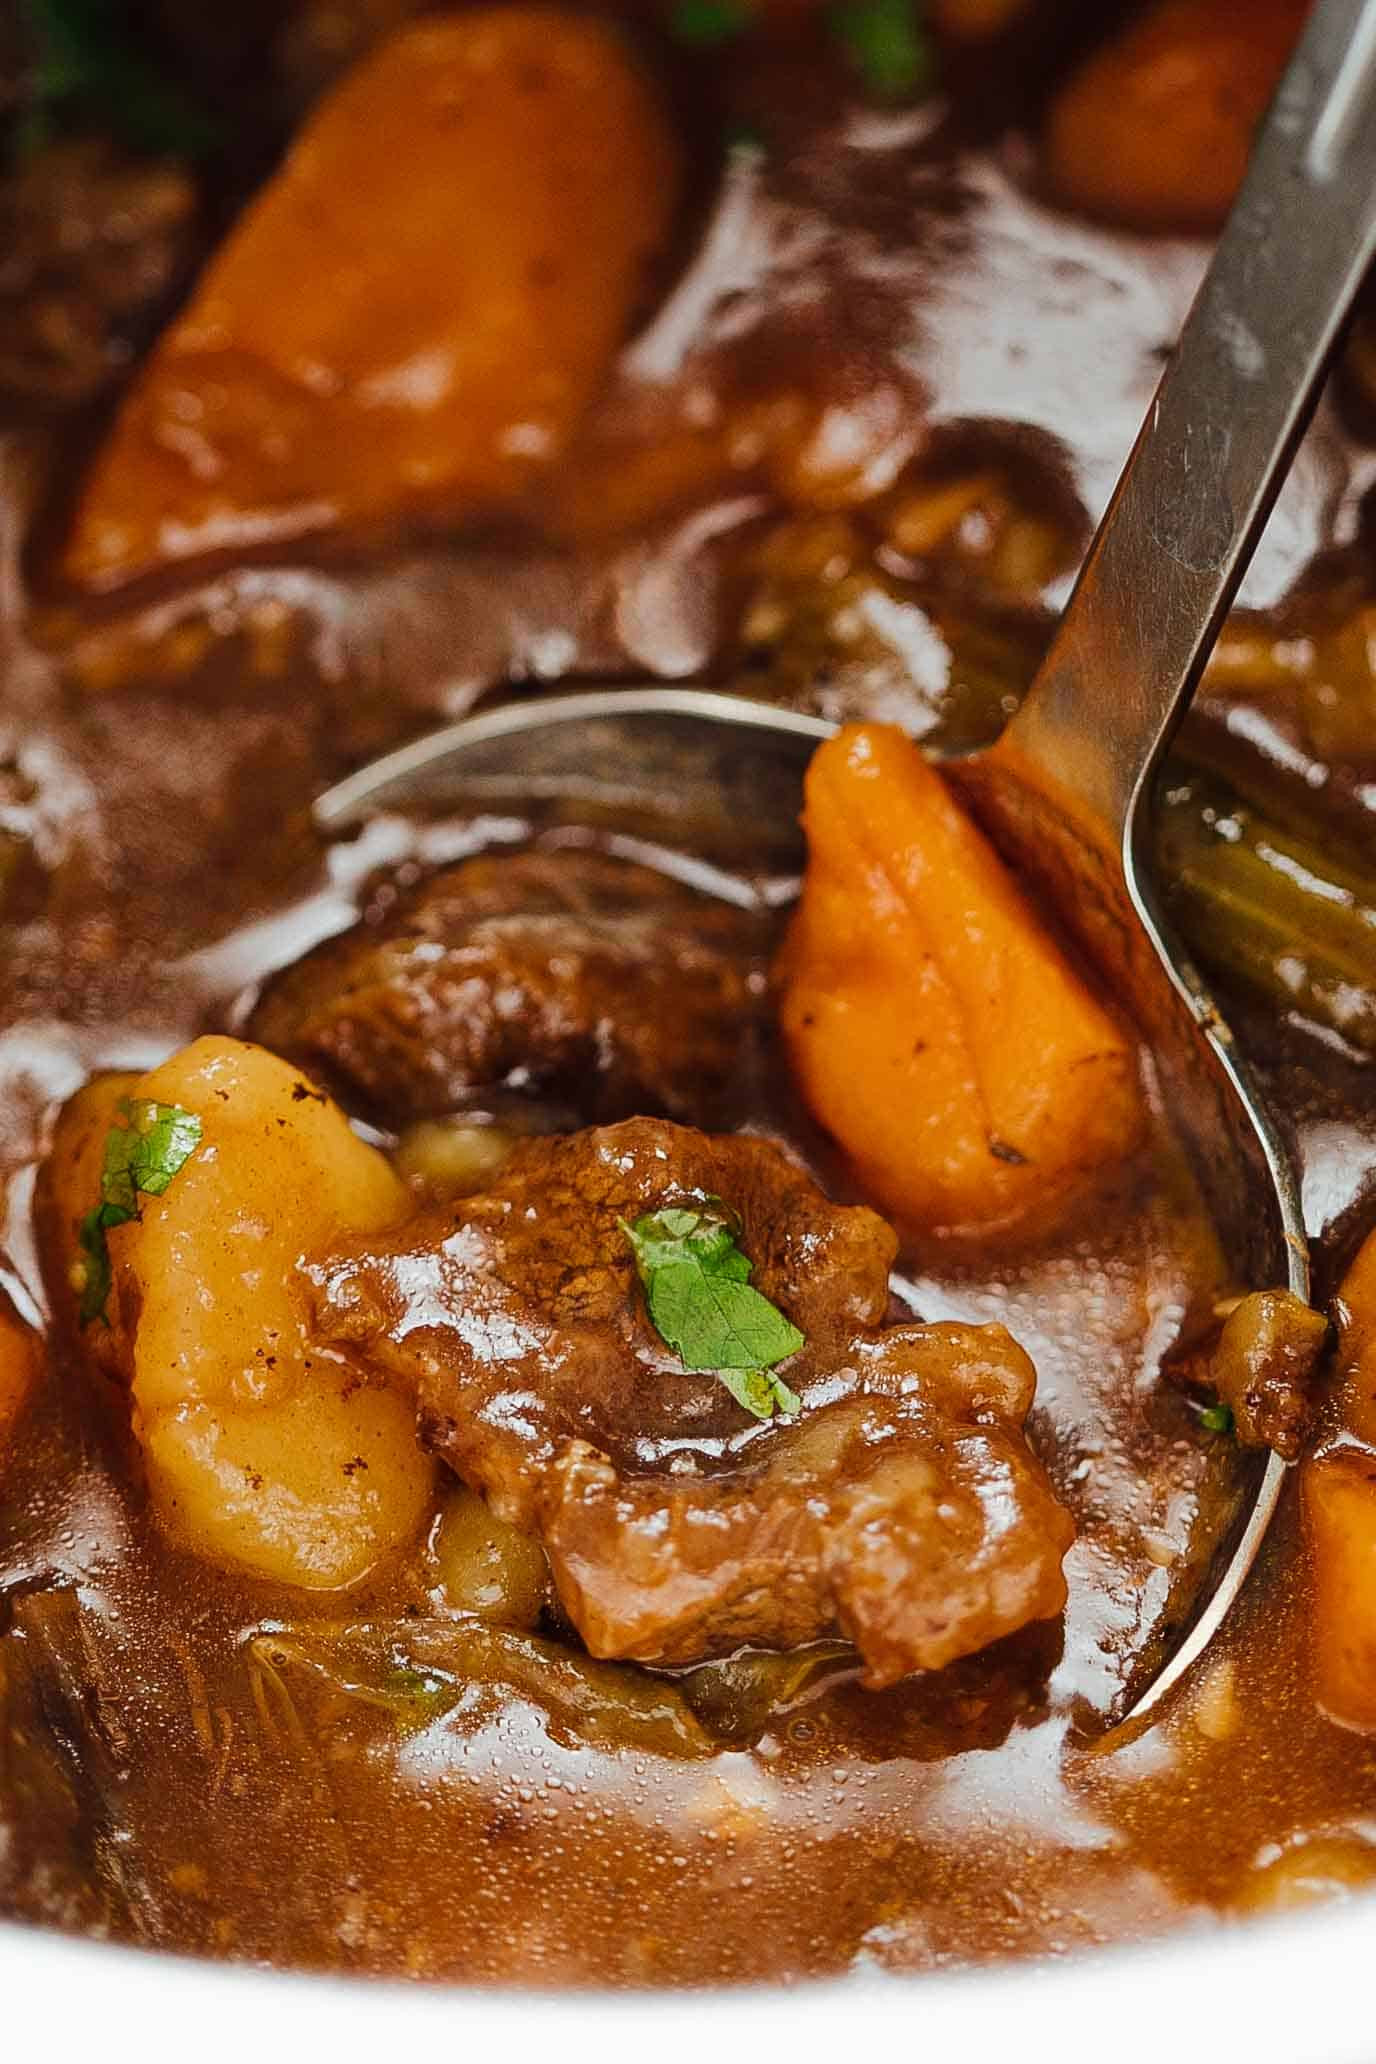 Instant Pot Beef Stew Recipes  Easy Instant Pot Beef Stew Tender beef stew in just over